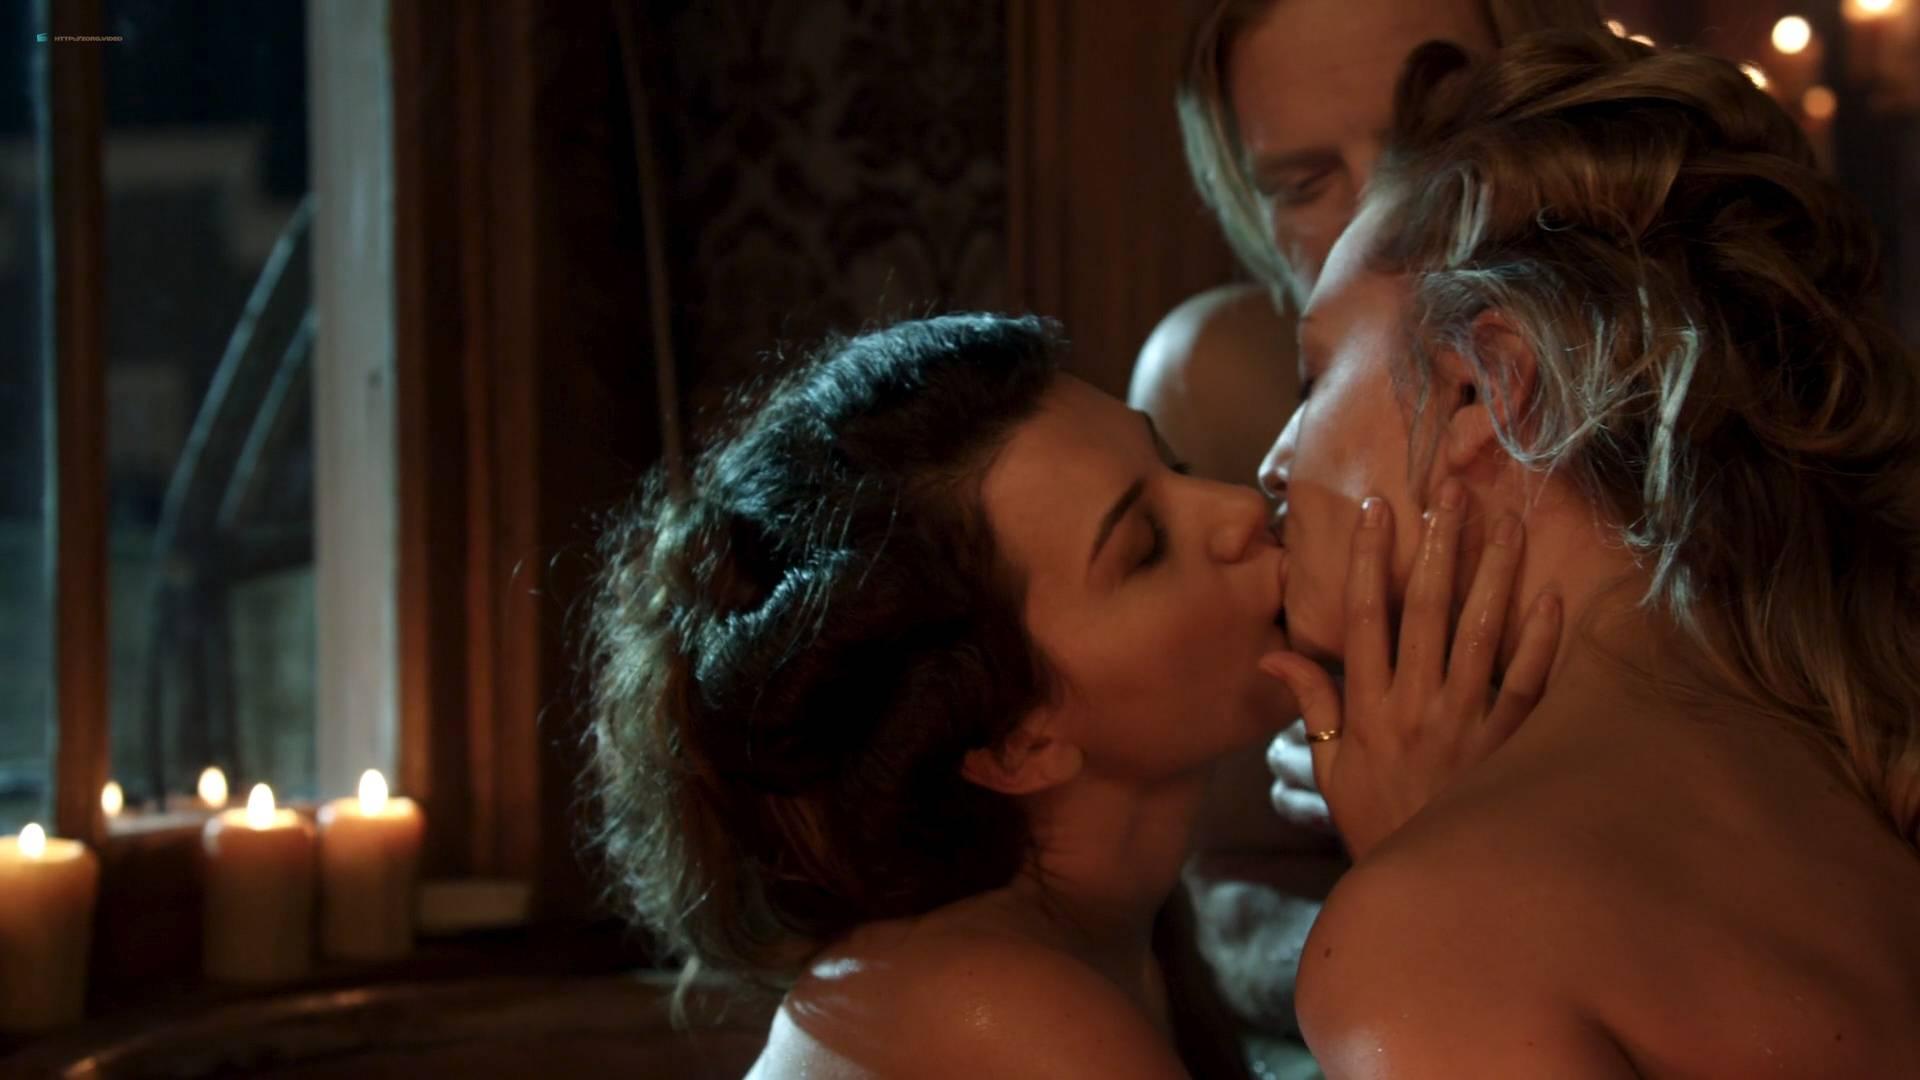 Elizabeth-Lavender-nude-topless-Elysia-Rotaru-nude-butt-boobs-Dead-Again-in-Tombstone-2017-HD-1080p-BluRay-12.jpg